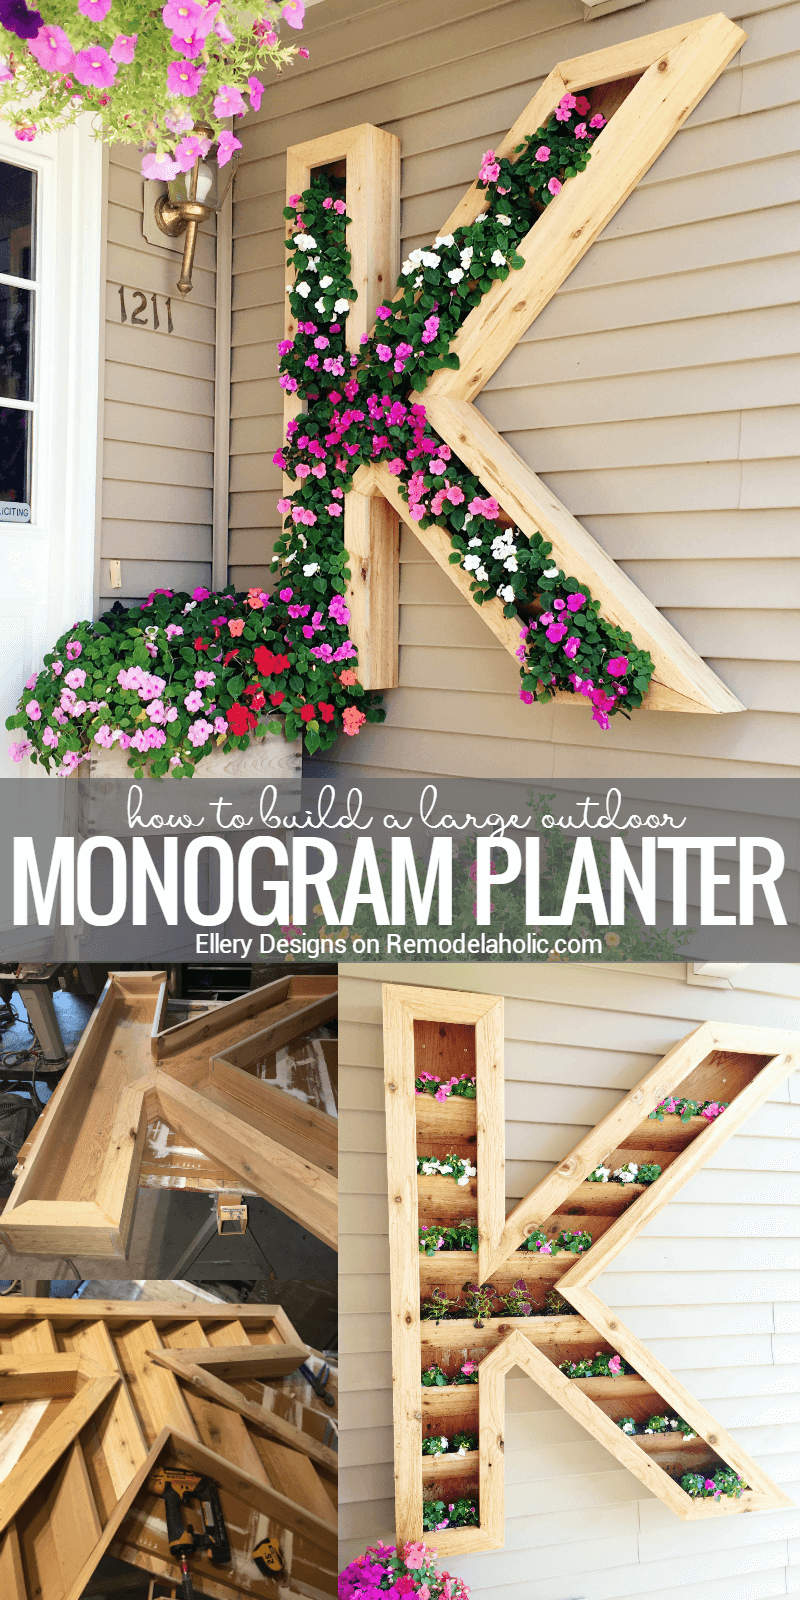 Personalized Hanging Wooden Monogram Planter